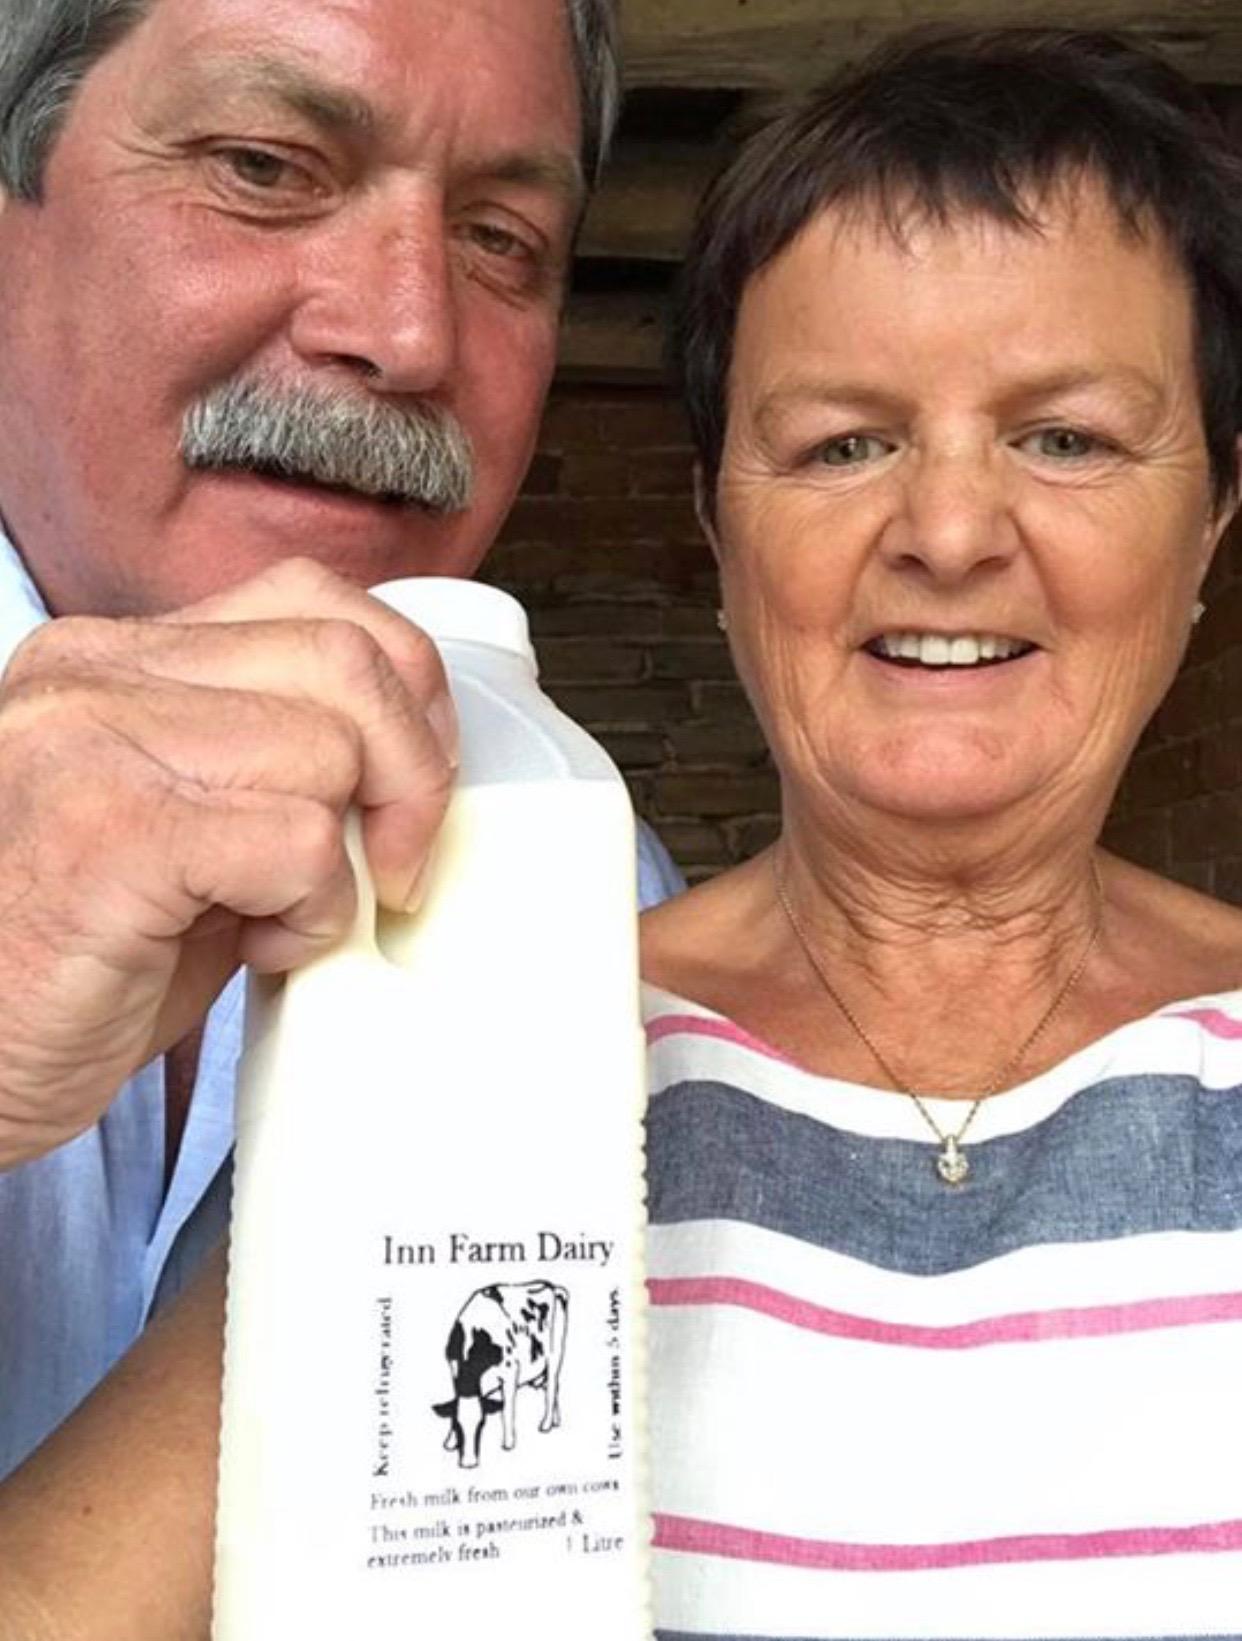 Inn Far Dairy Ashbourne